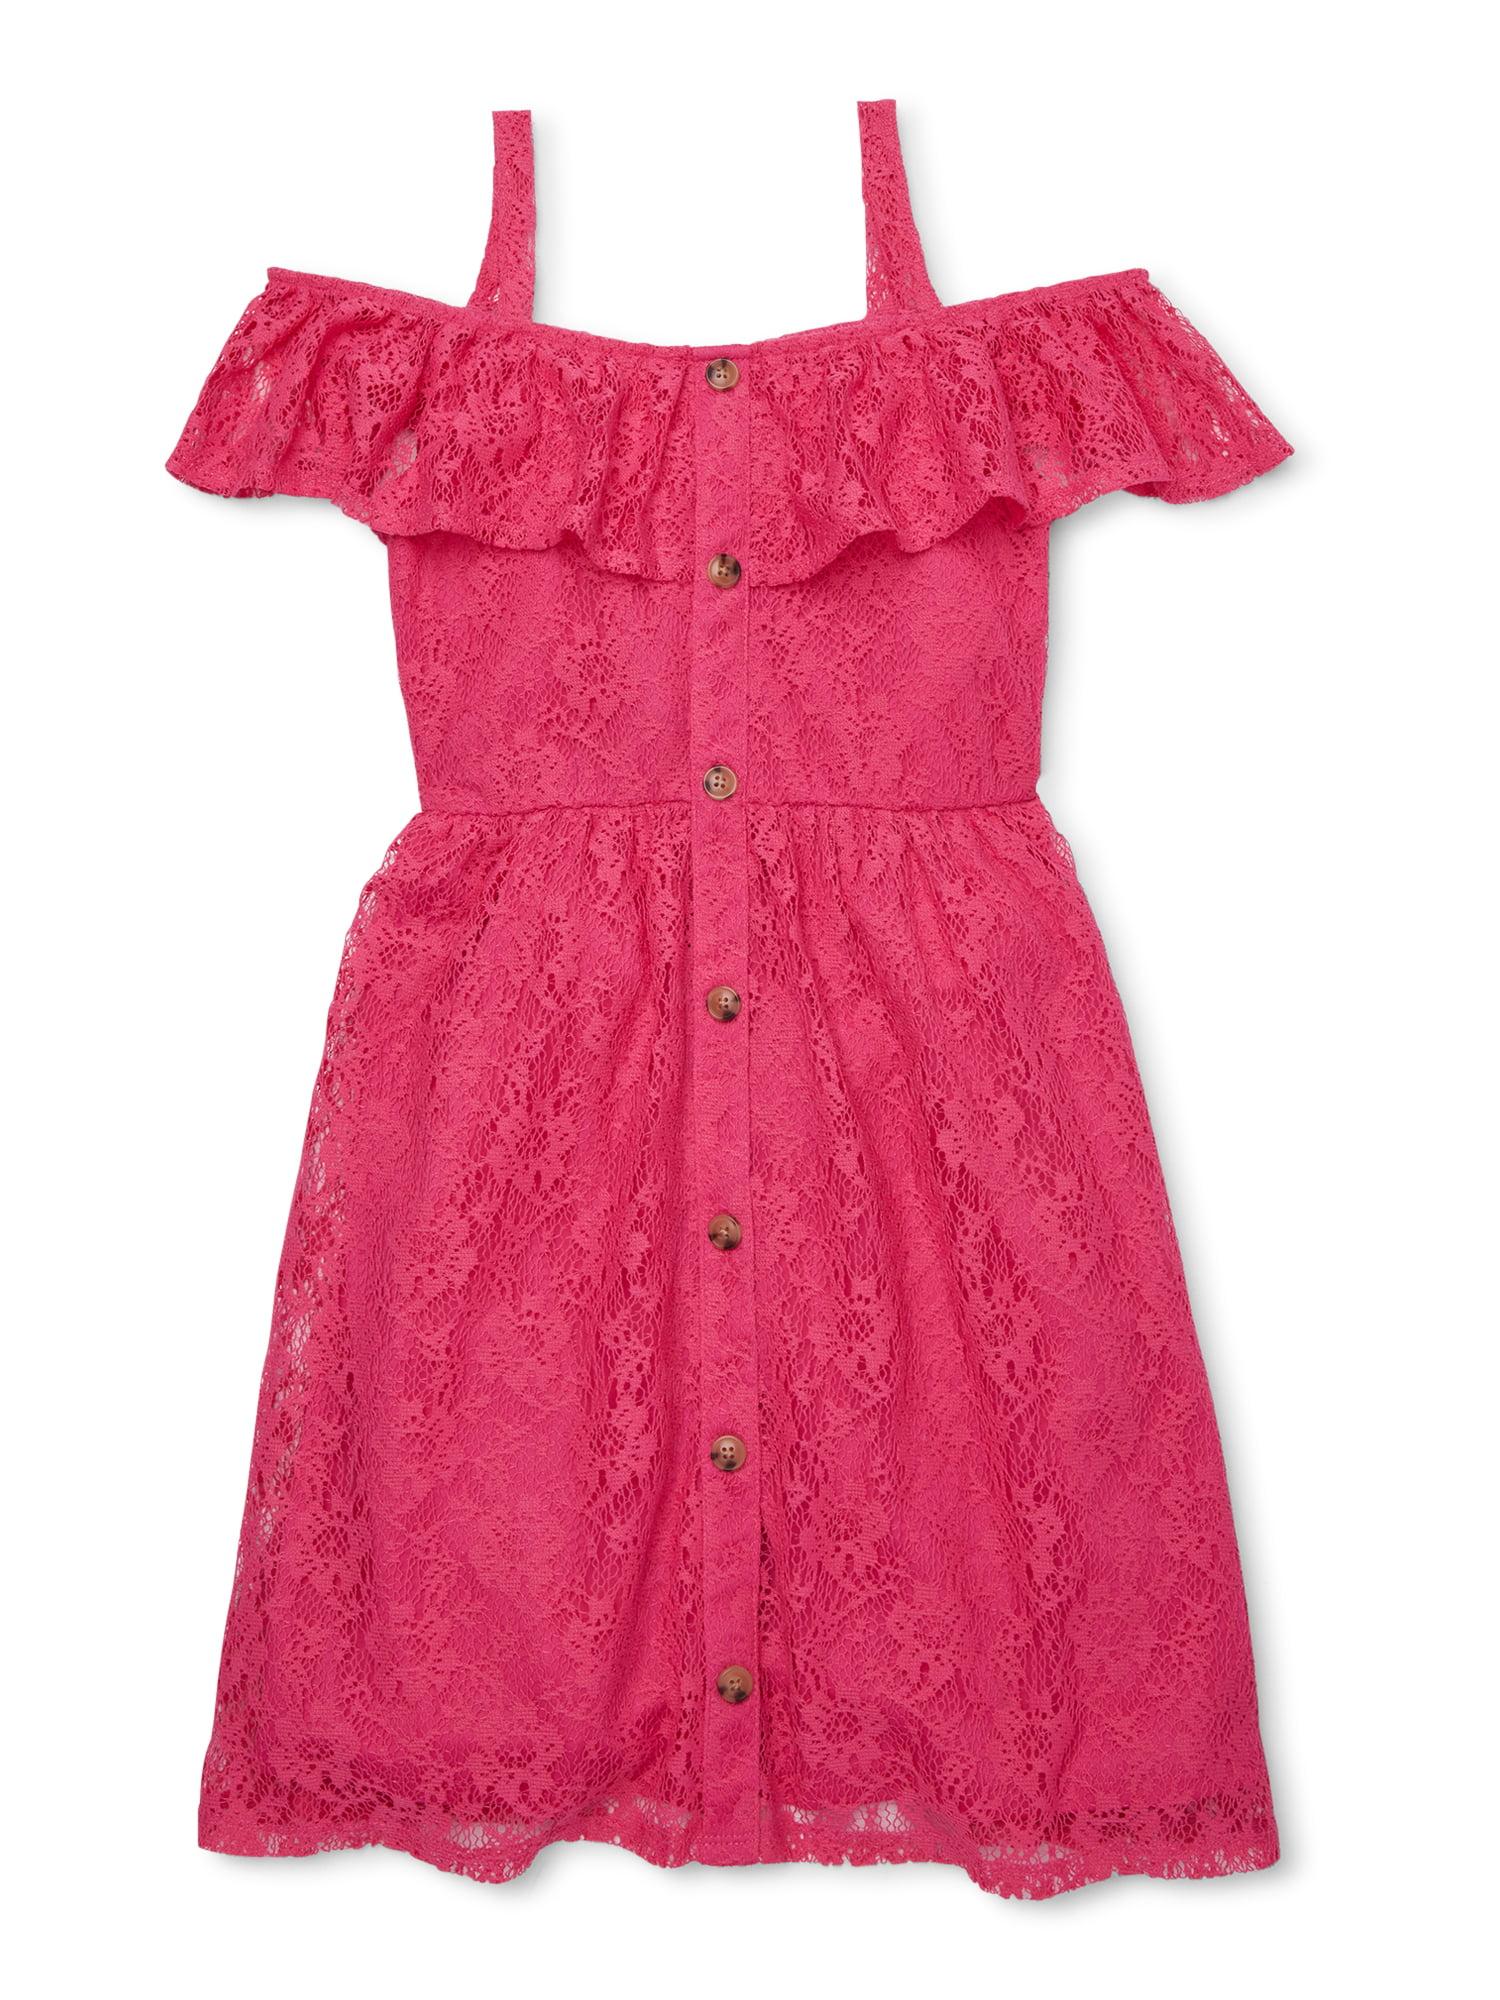 Mignone Grey Pink Girls Longsleeve Dress Ruffle Skirt Lace Sz 2T 3T 4T 5 6 7 8